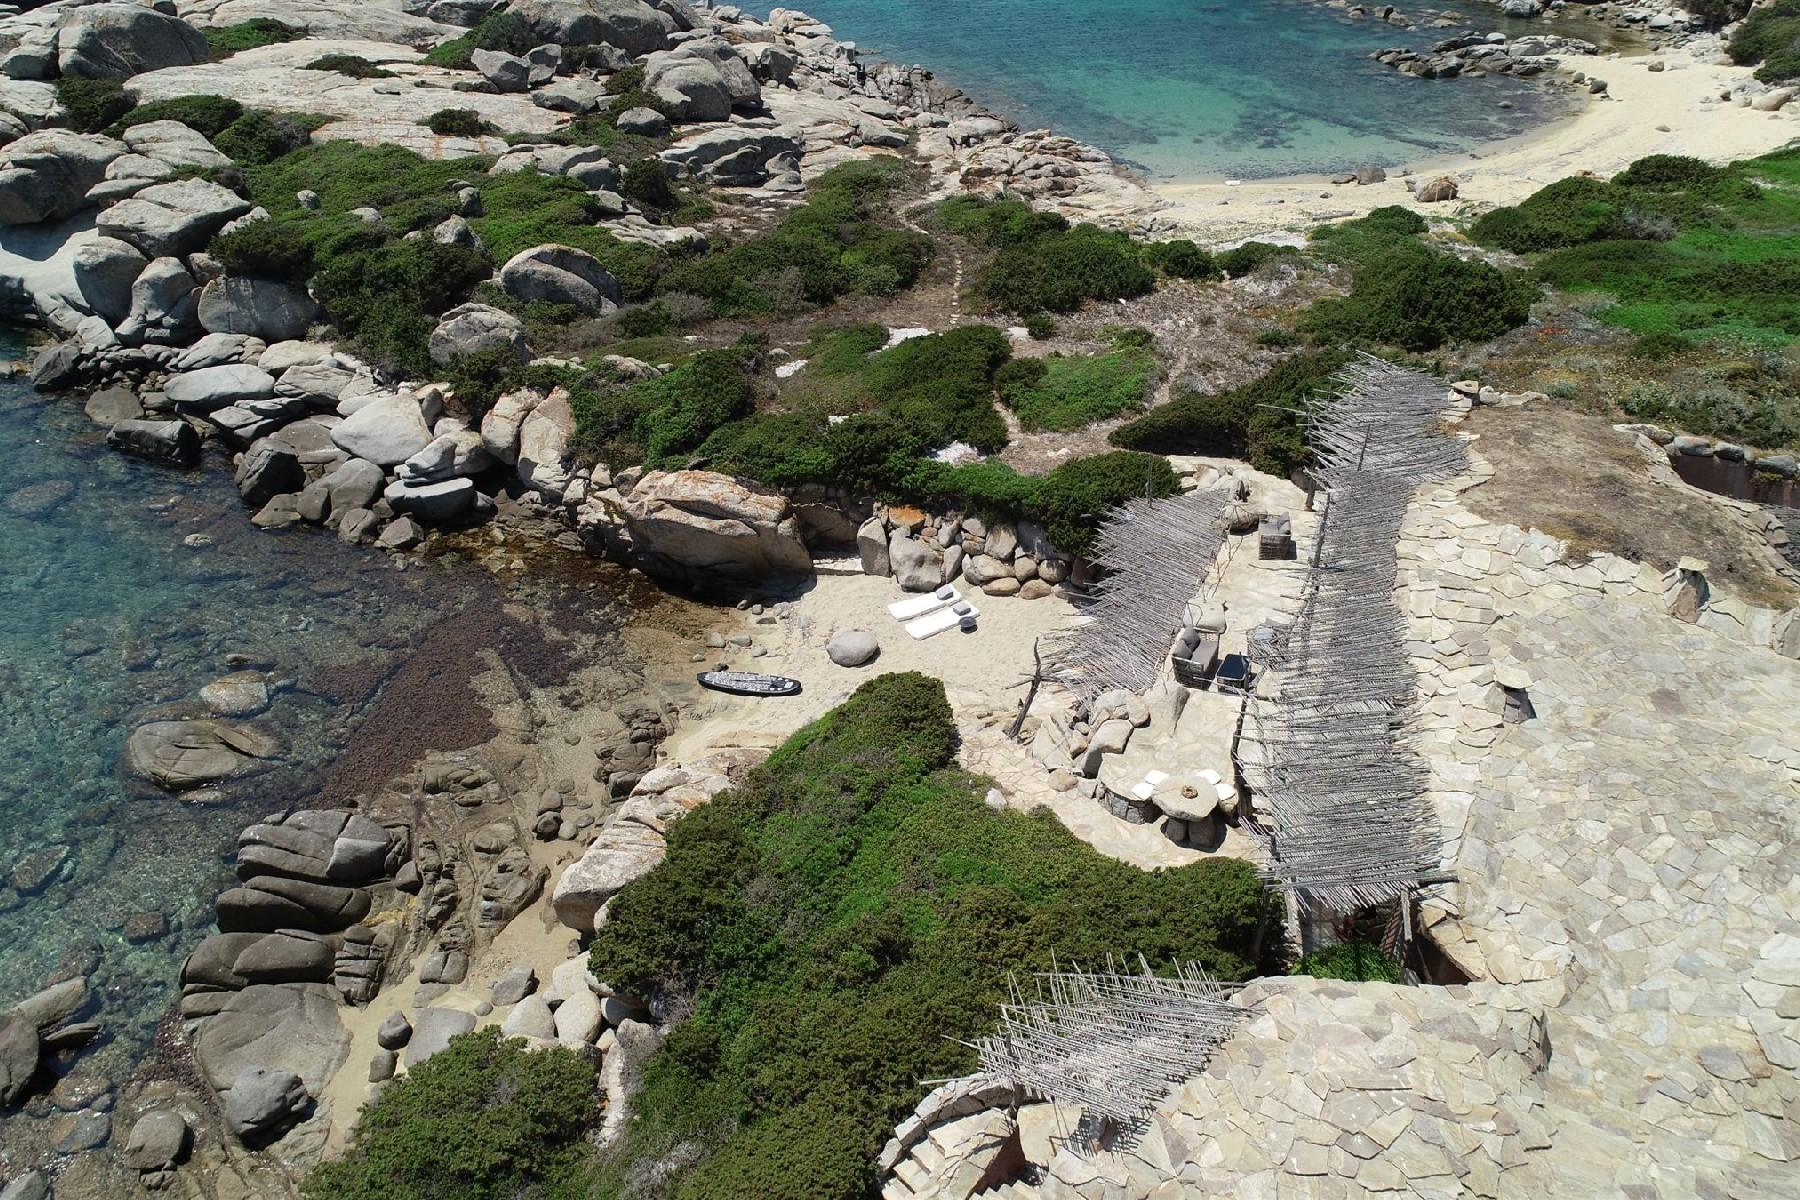 Iconica villa pieds dans l'eau all'ile de Cavallo - 14